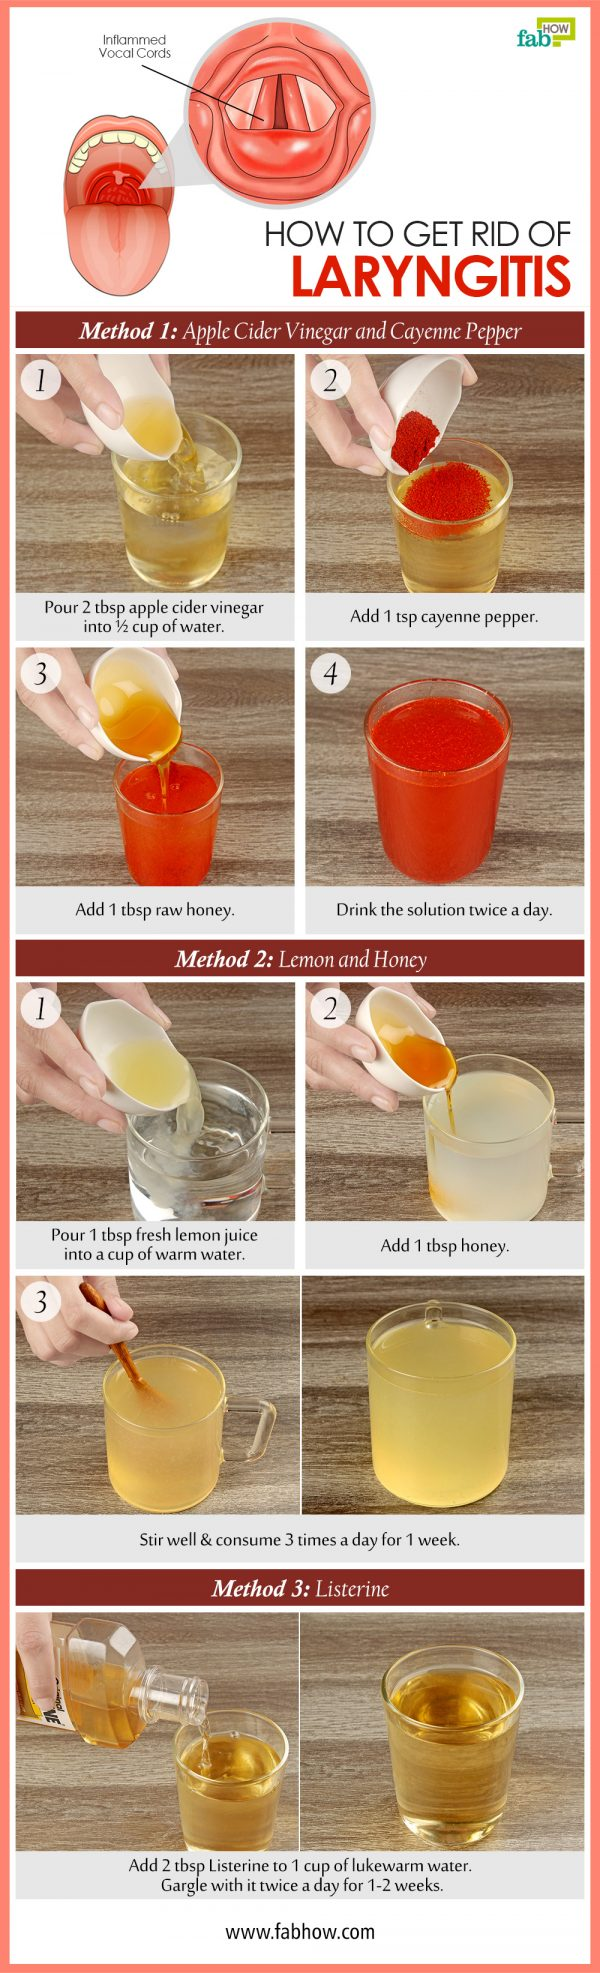 how to get rid of laryngitis